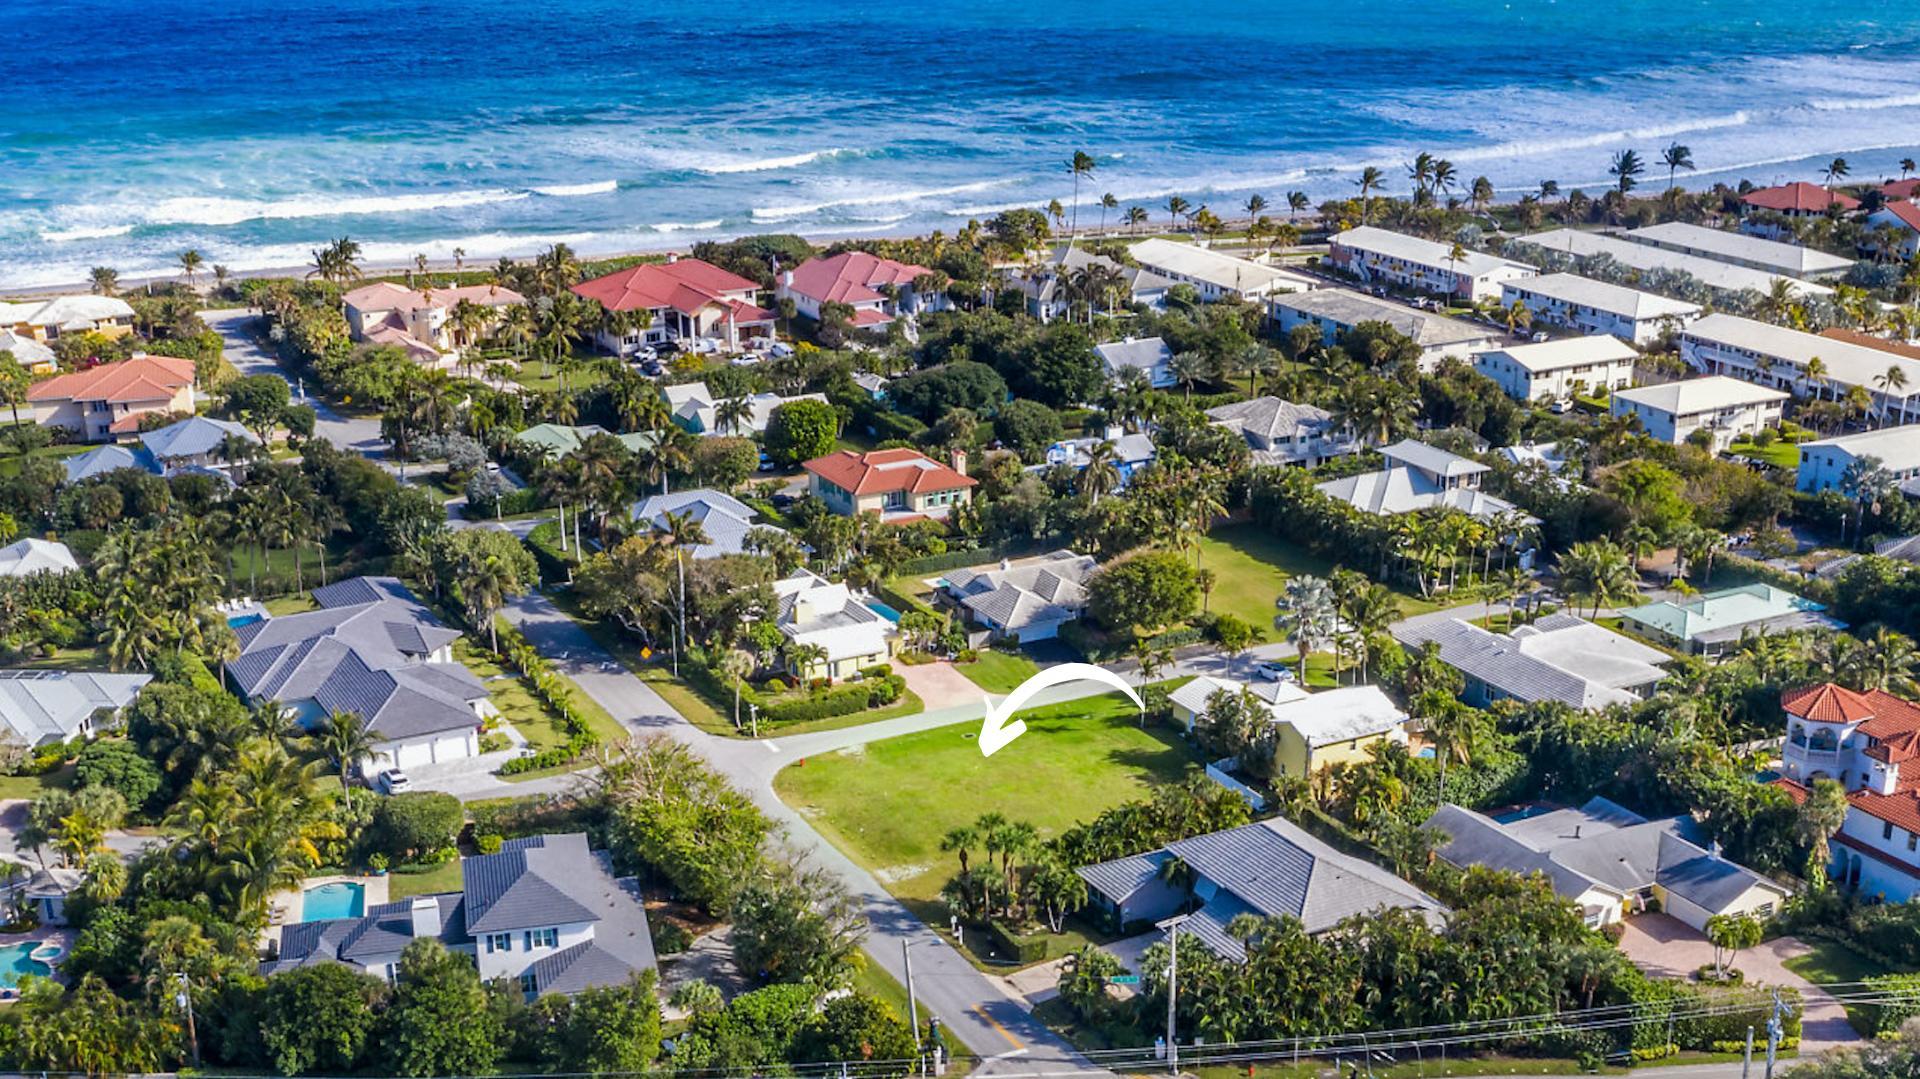 76 Beachway, Ocean Ridge, Florida 33435